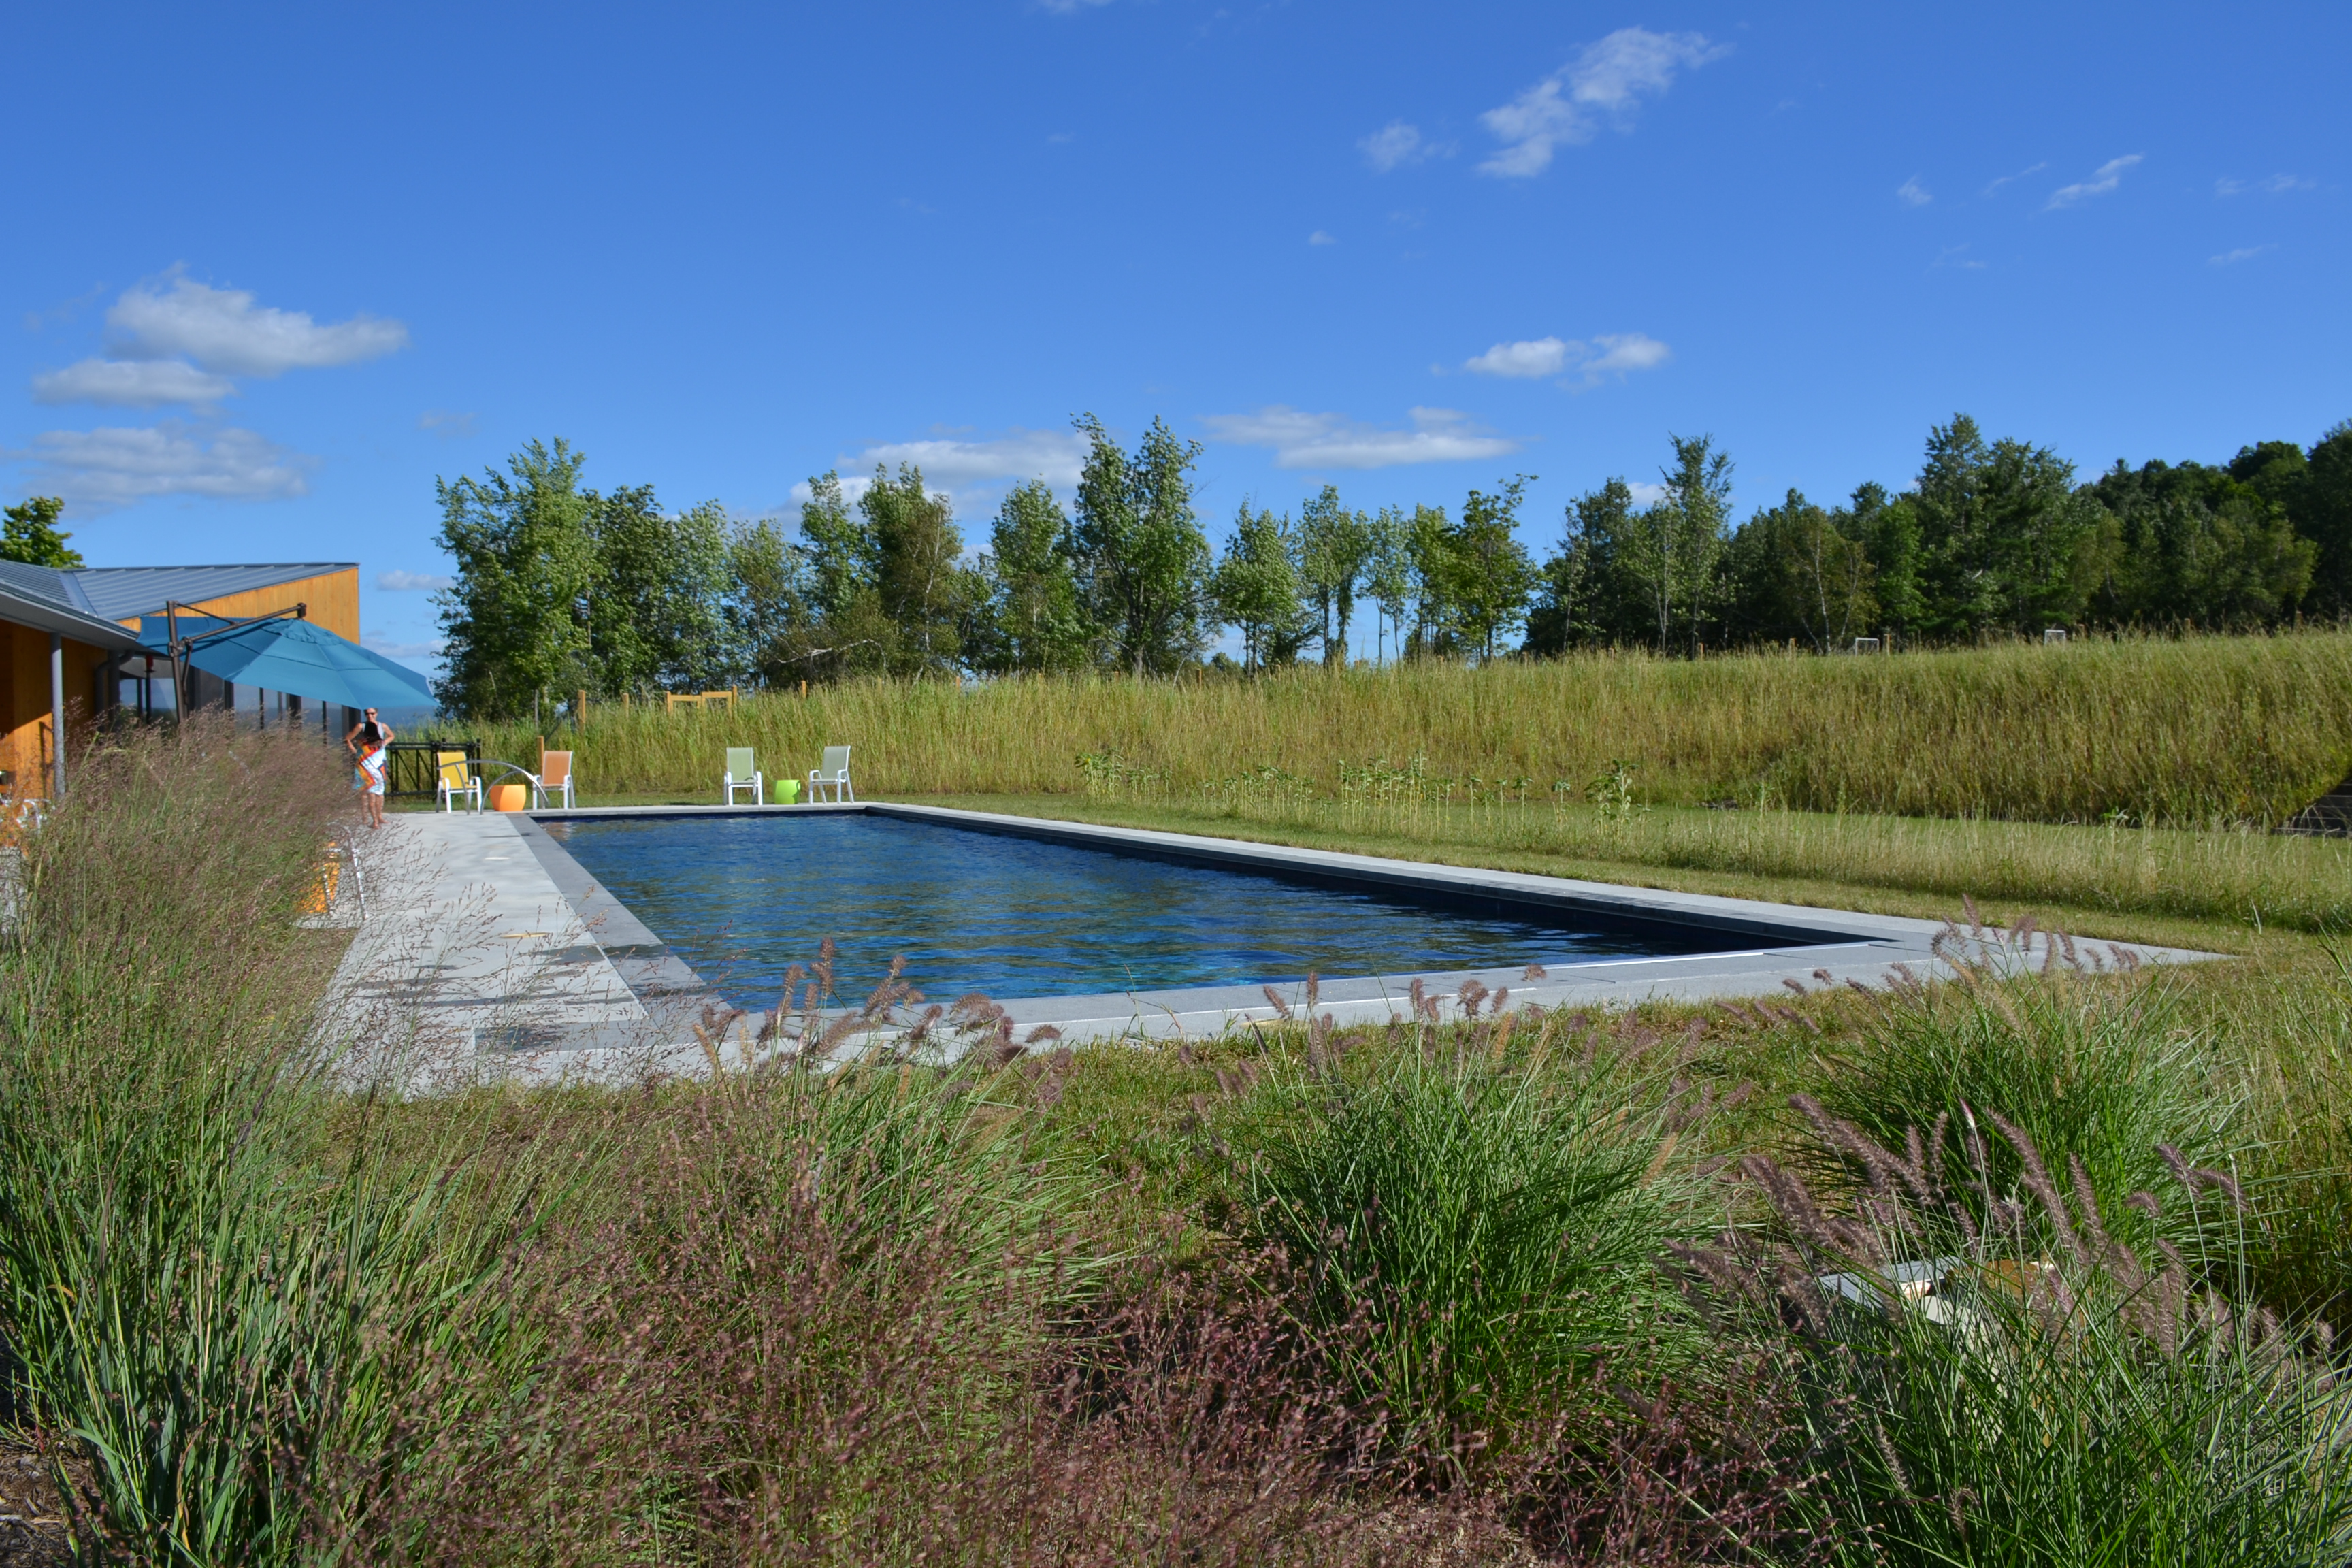 Claverack pool 2